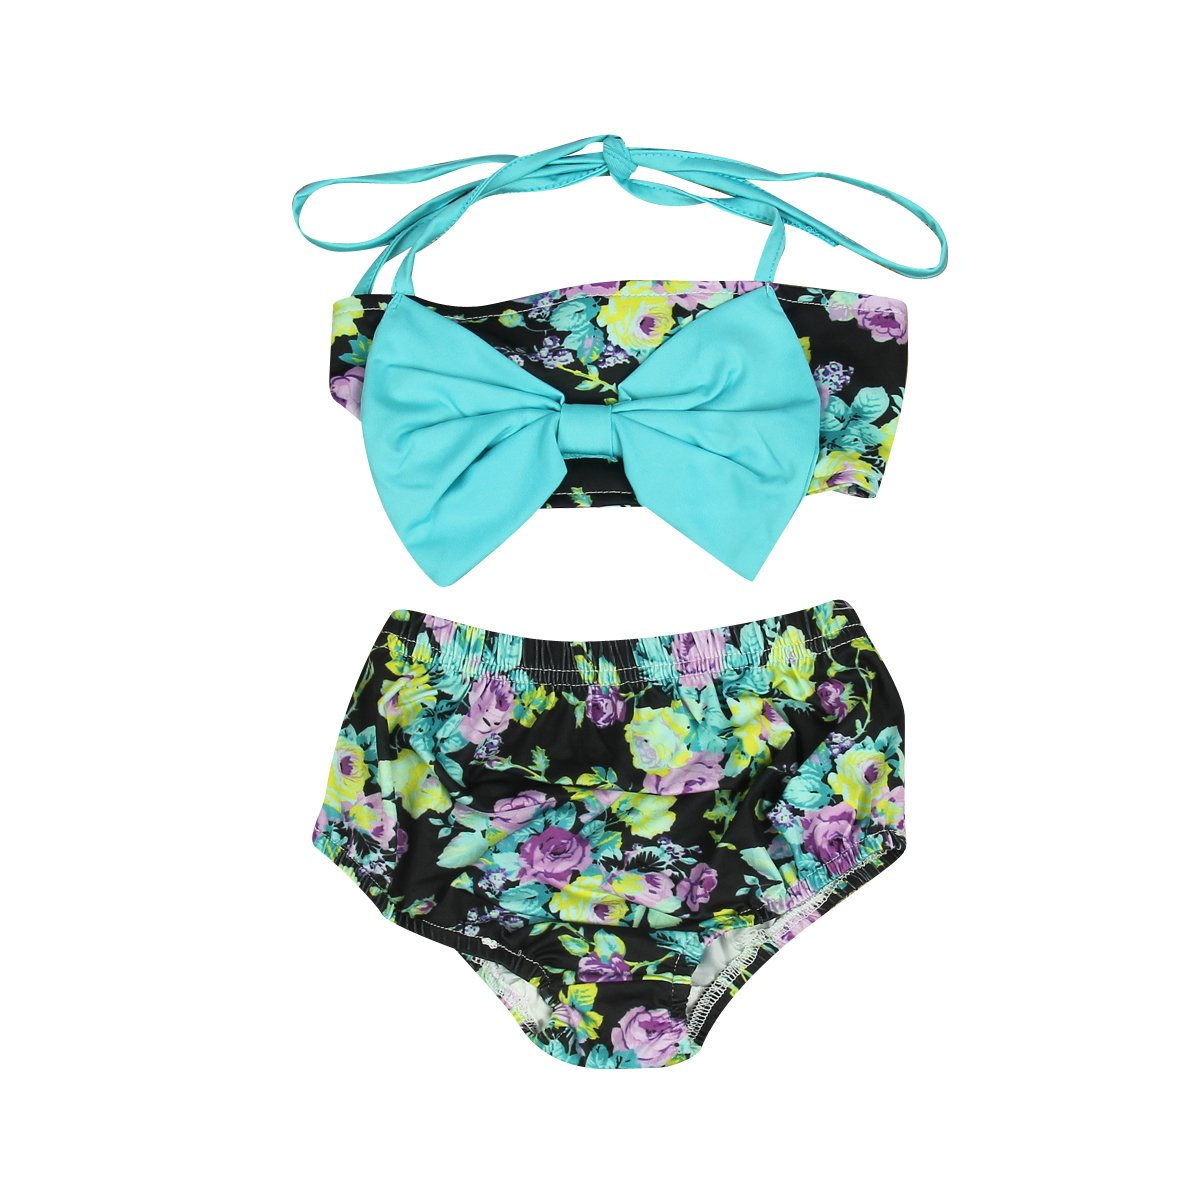 921a74d62 2pcs infantil bebé niñas trajes de baño lazo Floret Bikini Bañador  Beachwear Swimsuit Swimwear ...